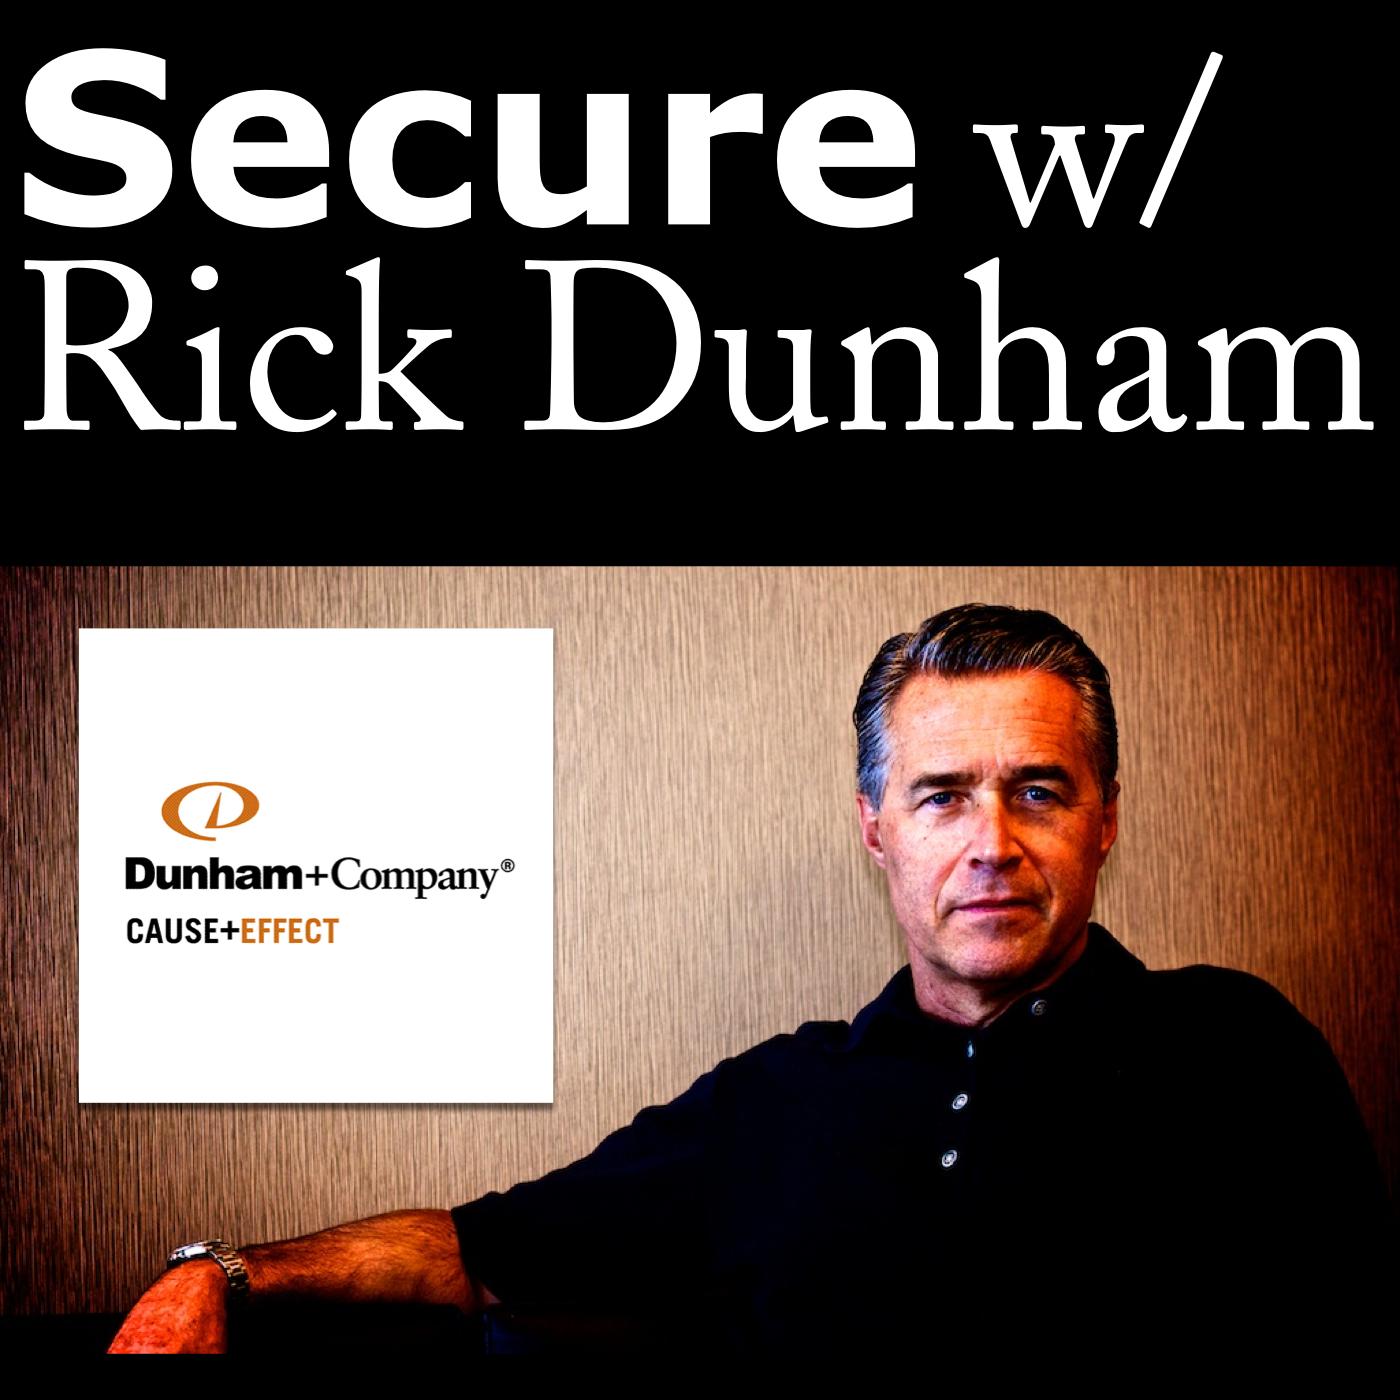 Secure w/ Rick Dunham